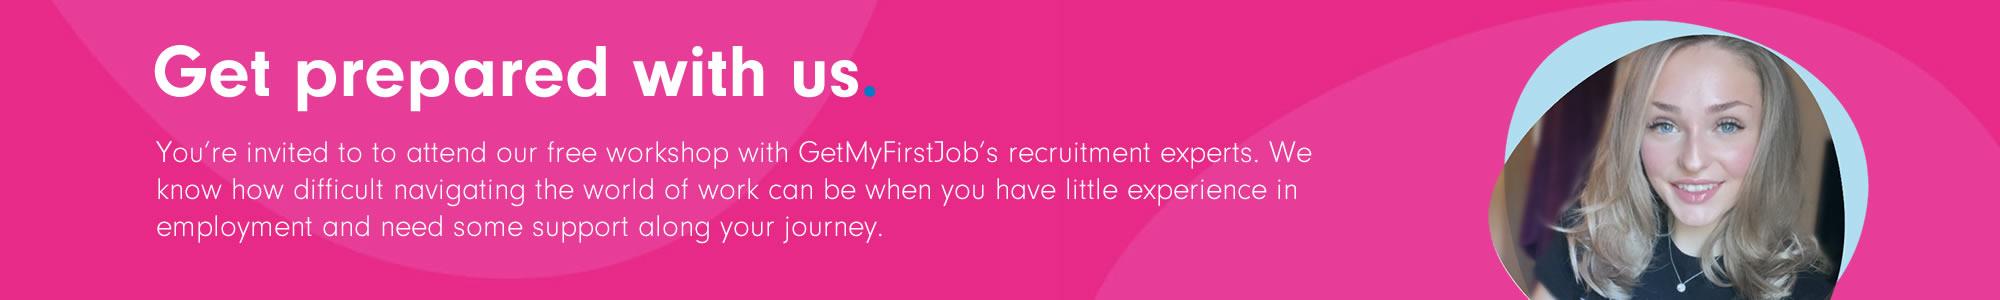 GetMyFirstJob - Get prepared with us | Free Recruitment Workshops